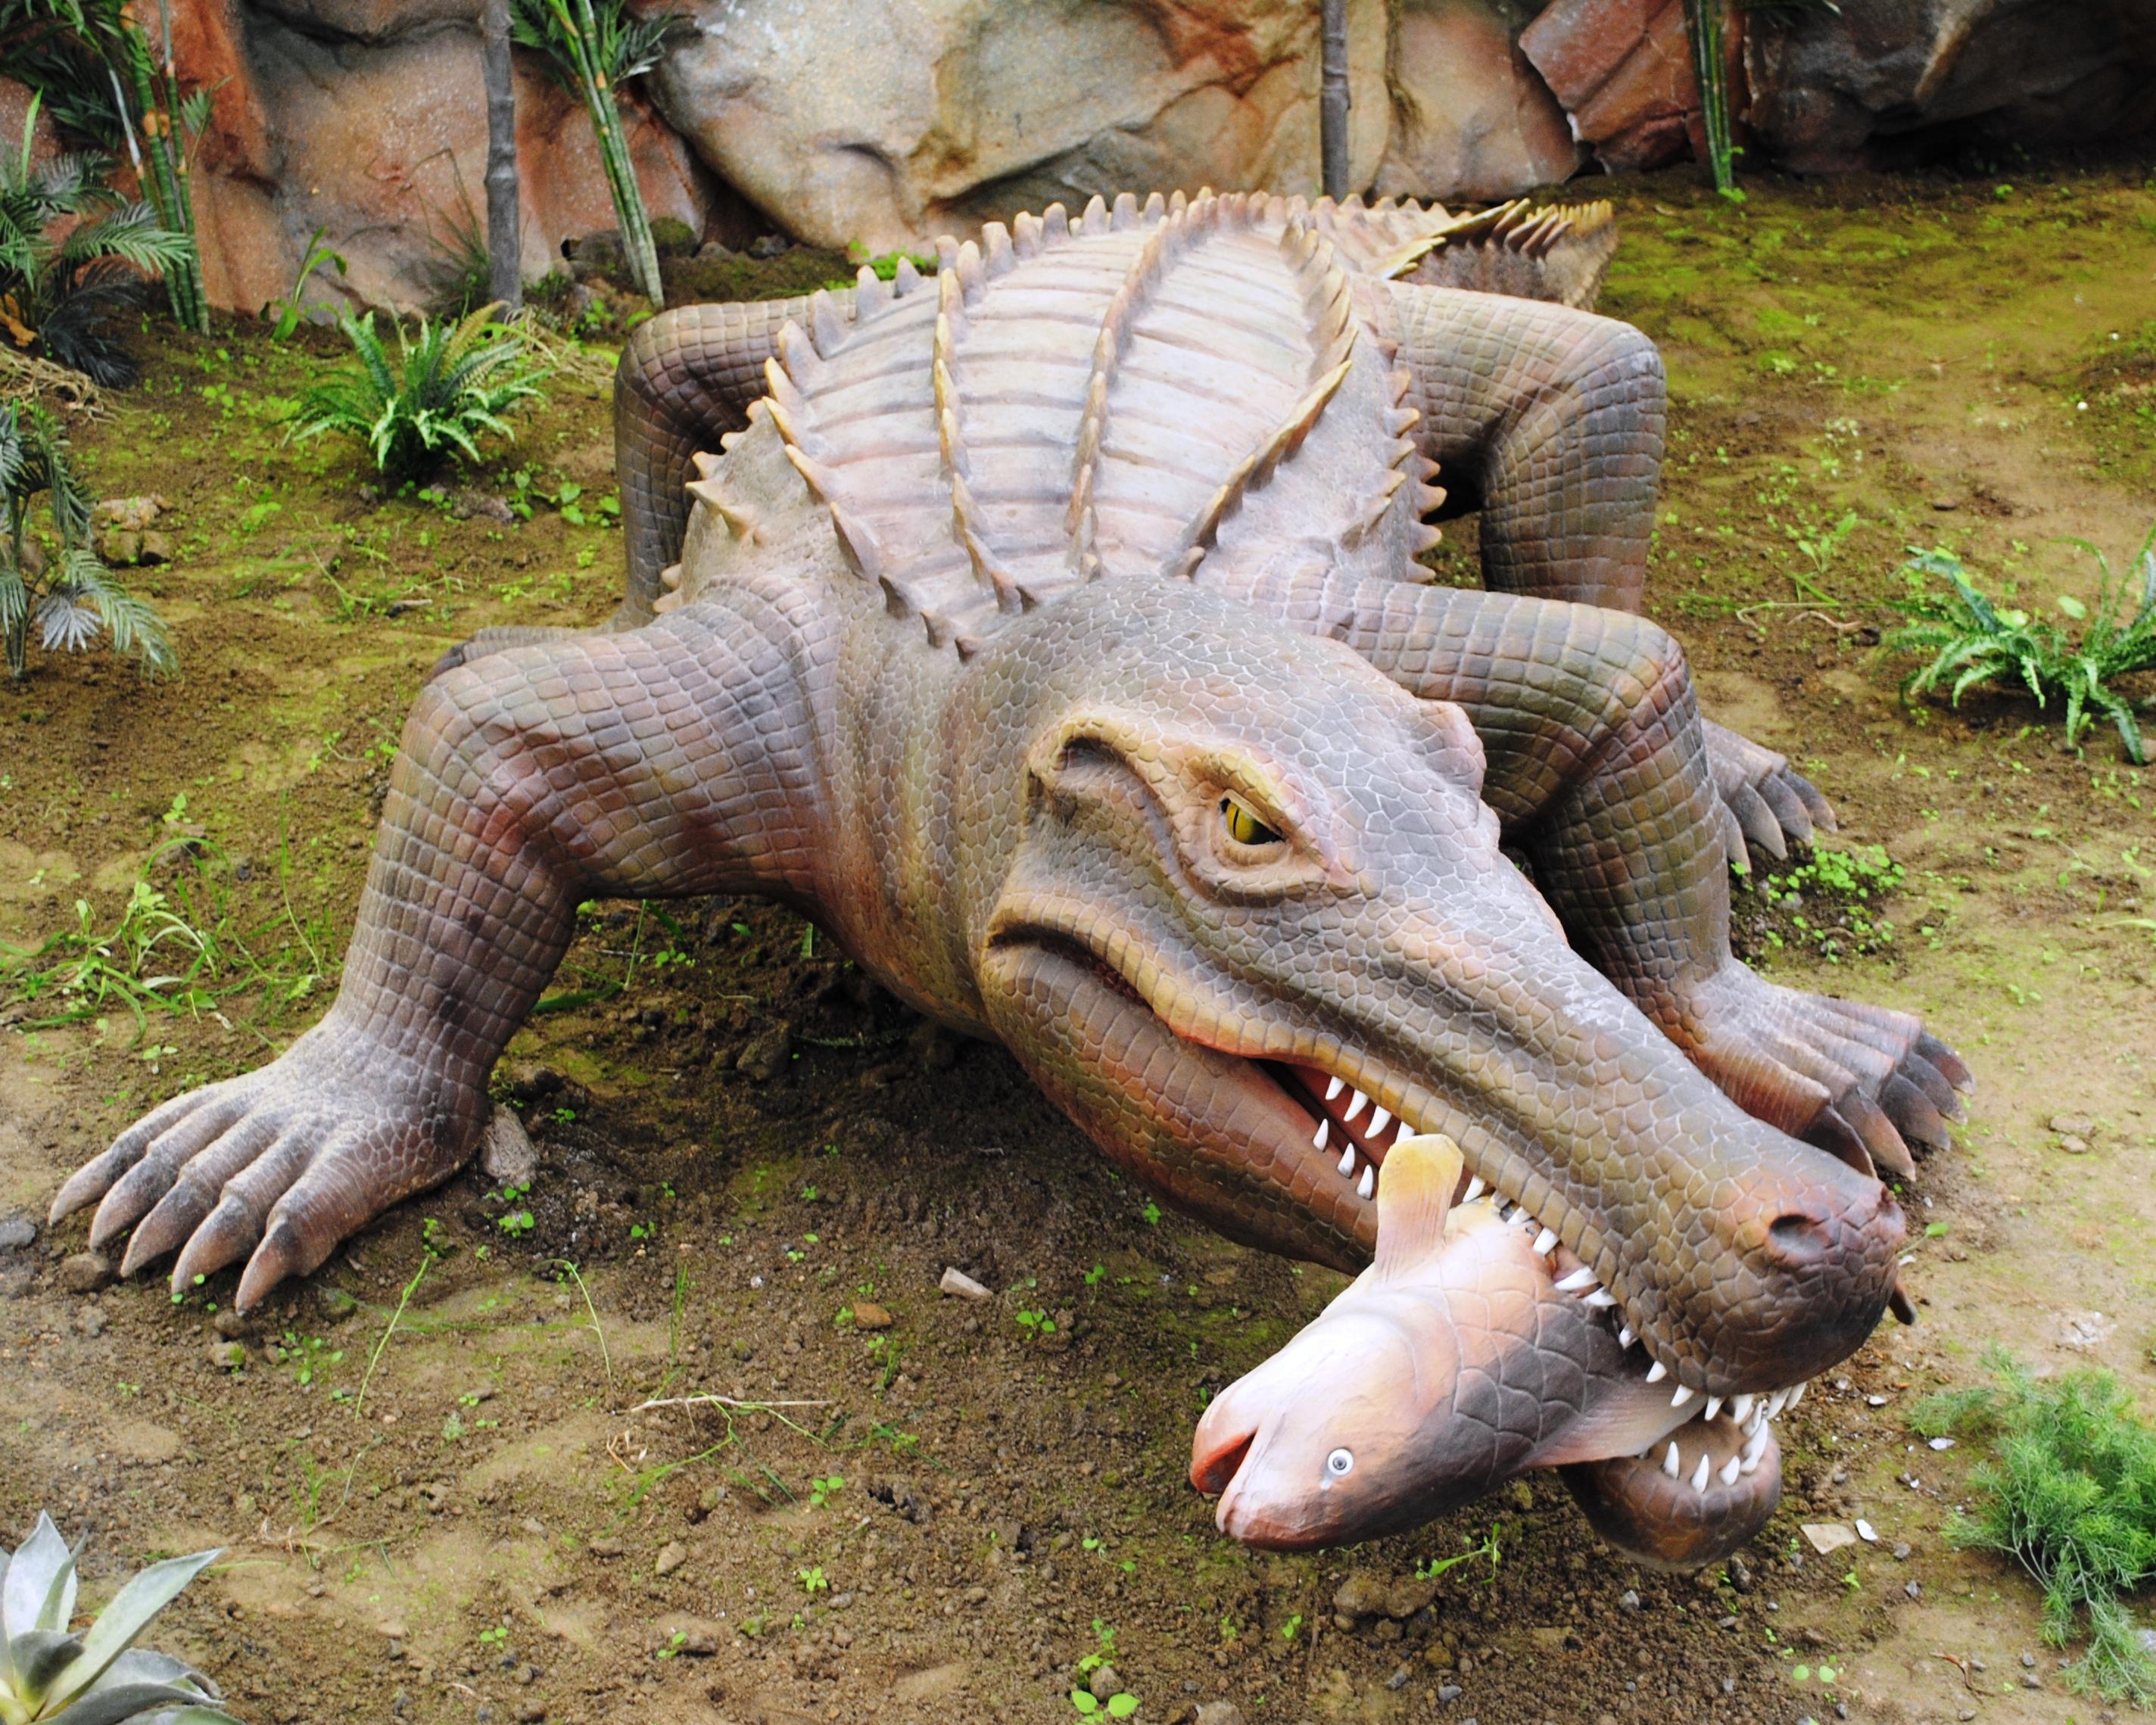 biggest crocodile in the world ever recorded